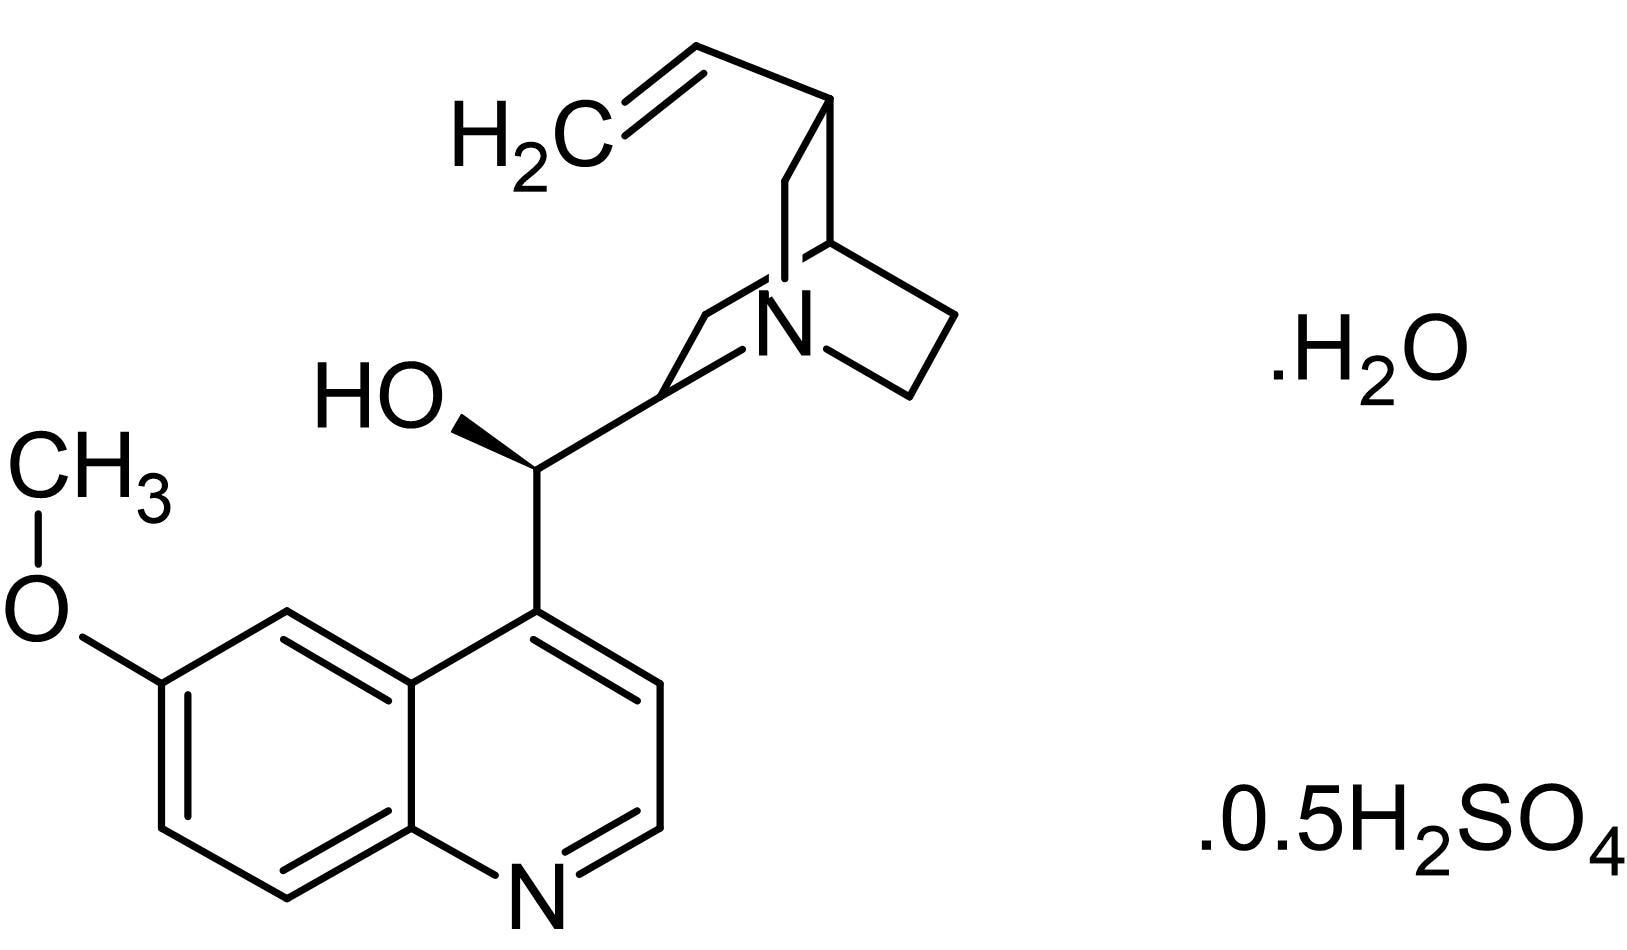 Chemical Structure - Quinine hemisulfate monohydrate, Potassium channel blocker (ab146327)